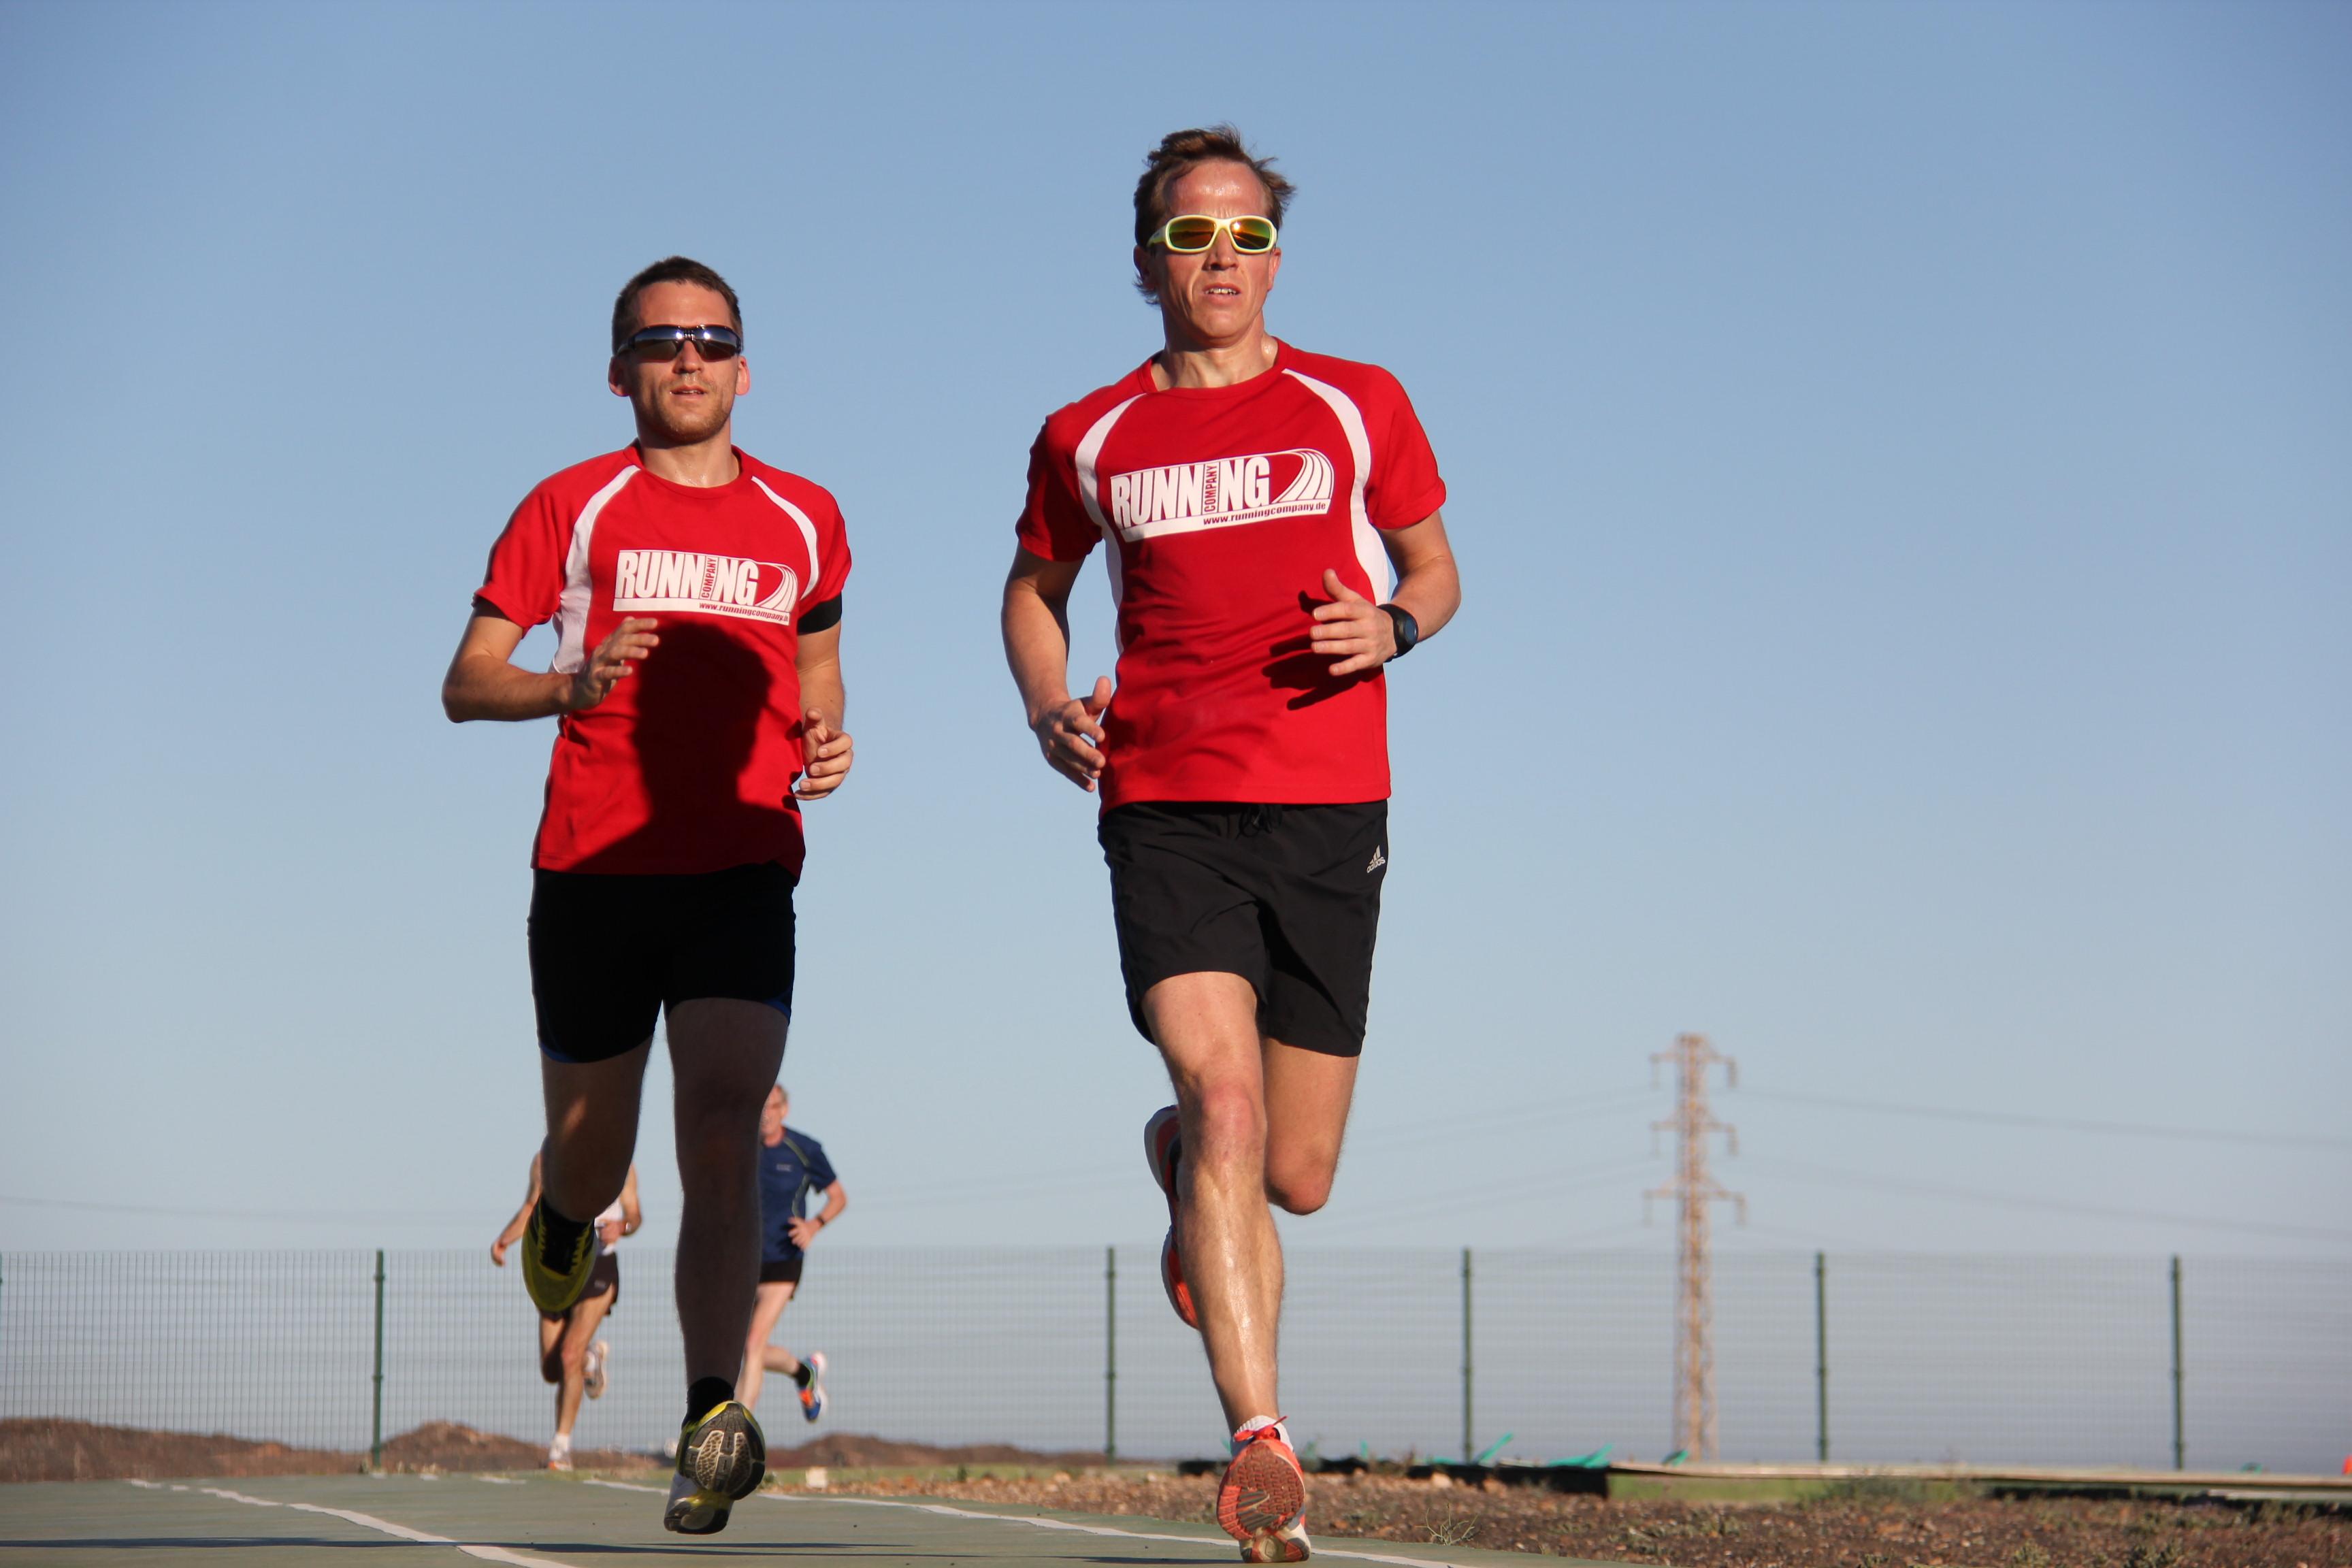 RUNNING Company Tempotraining auf der Laufbahn